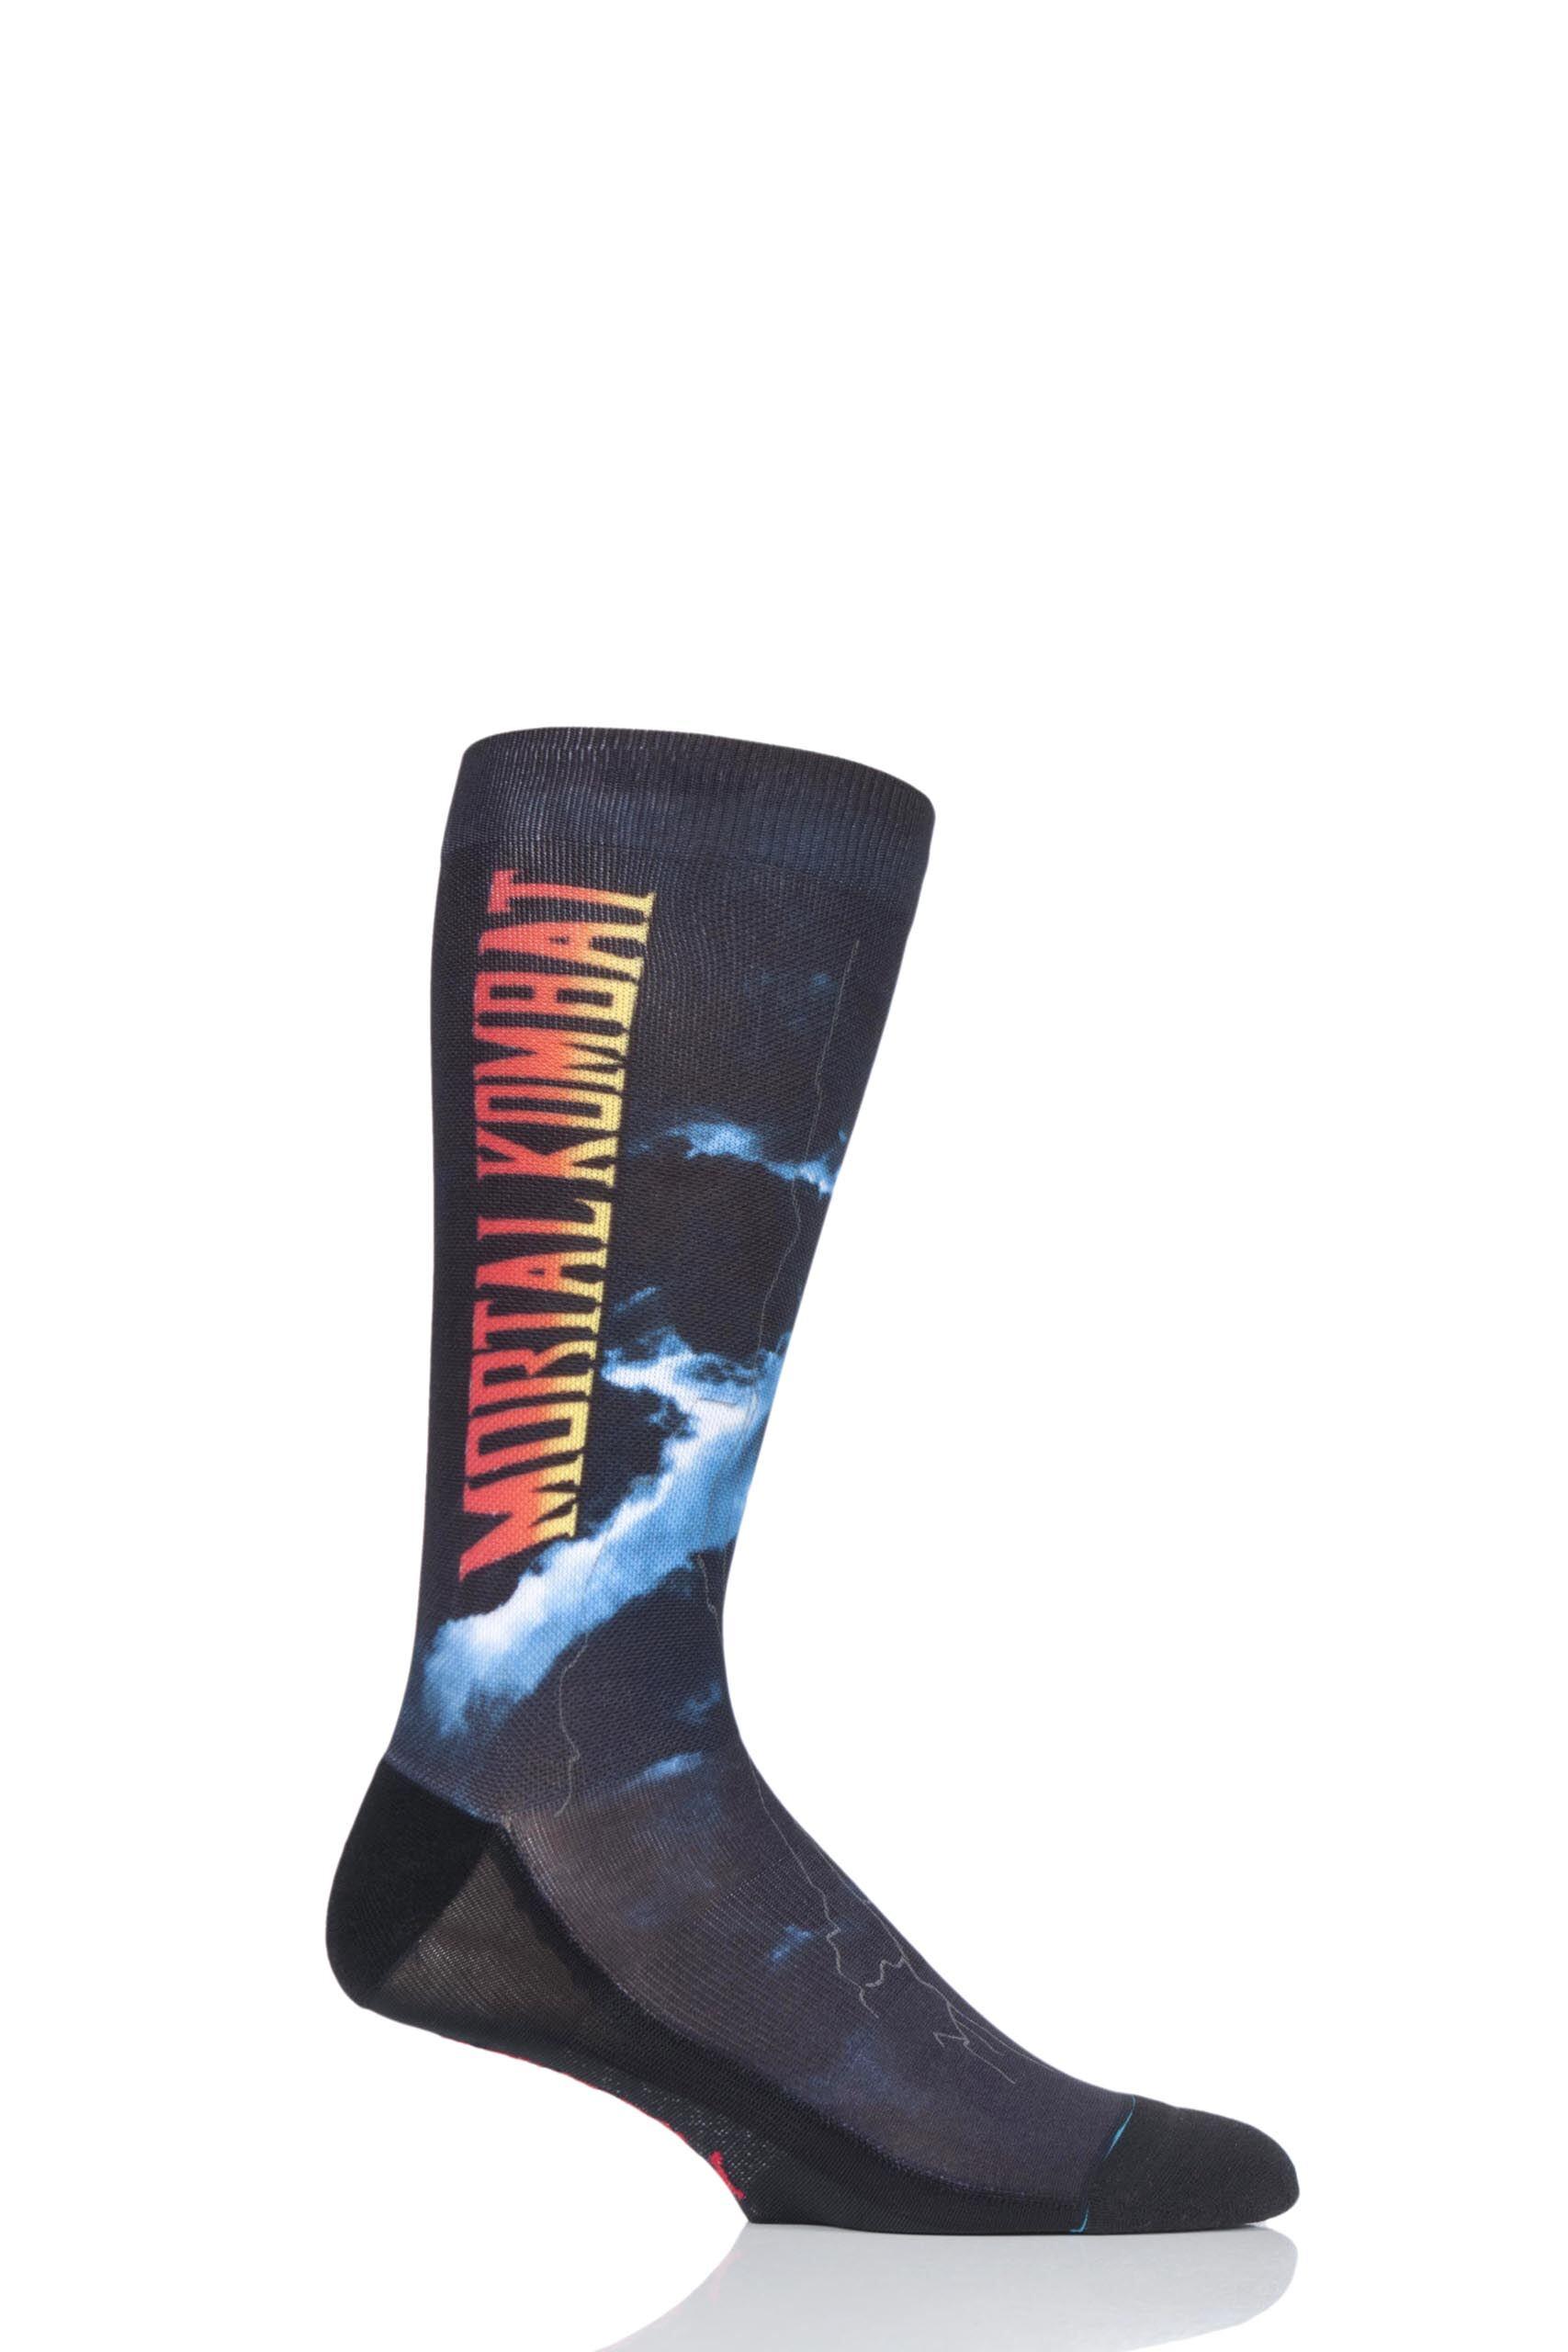 Image of 1 Pair Black Mortal Kombat II Socks Men's 8.5-11.5 Mens - Stance